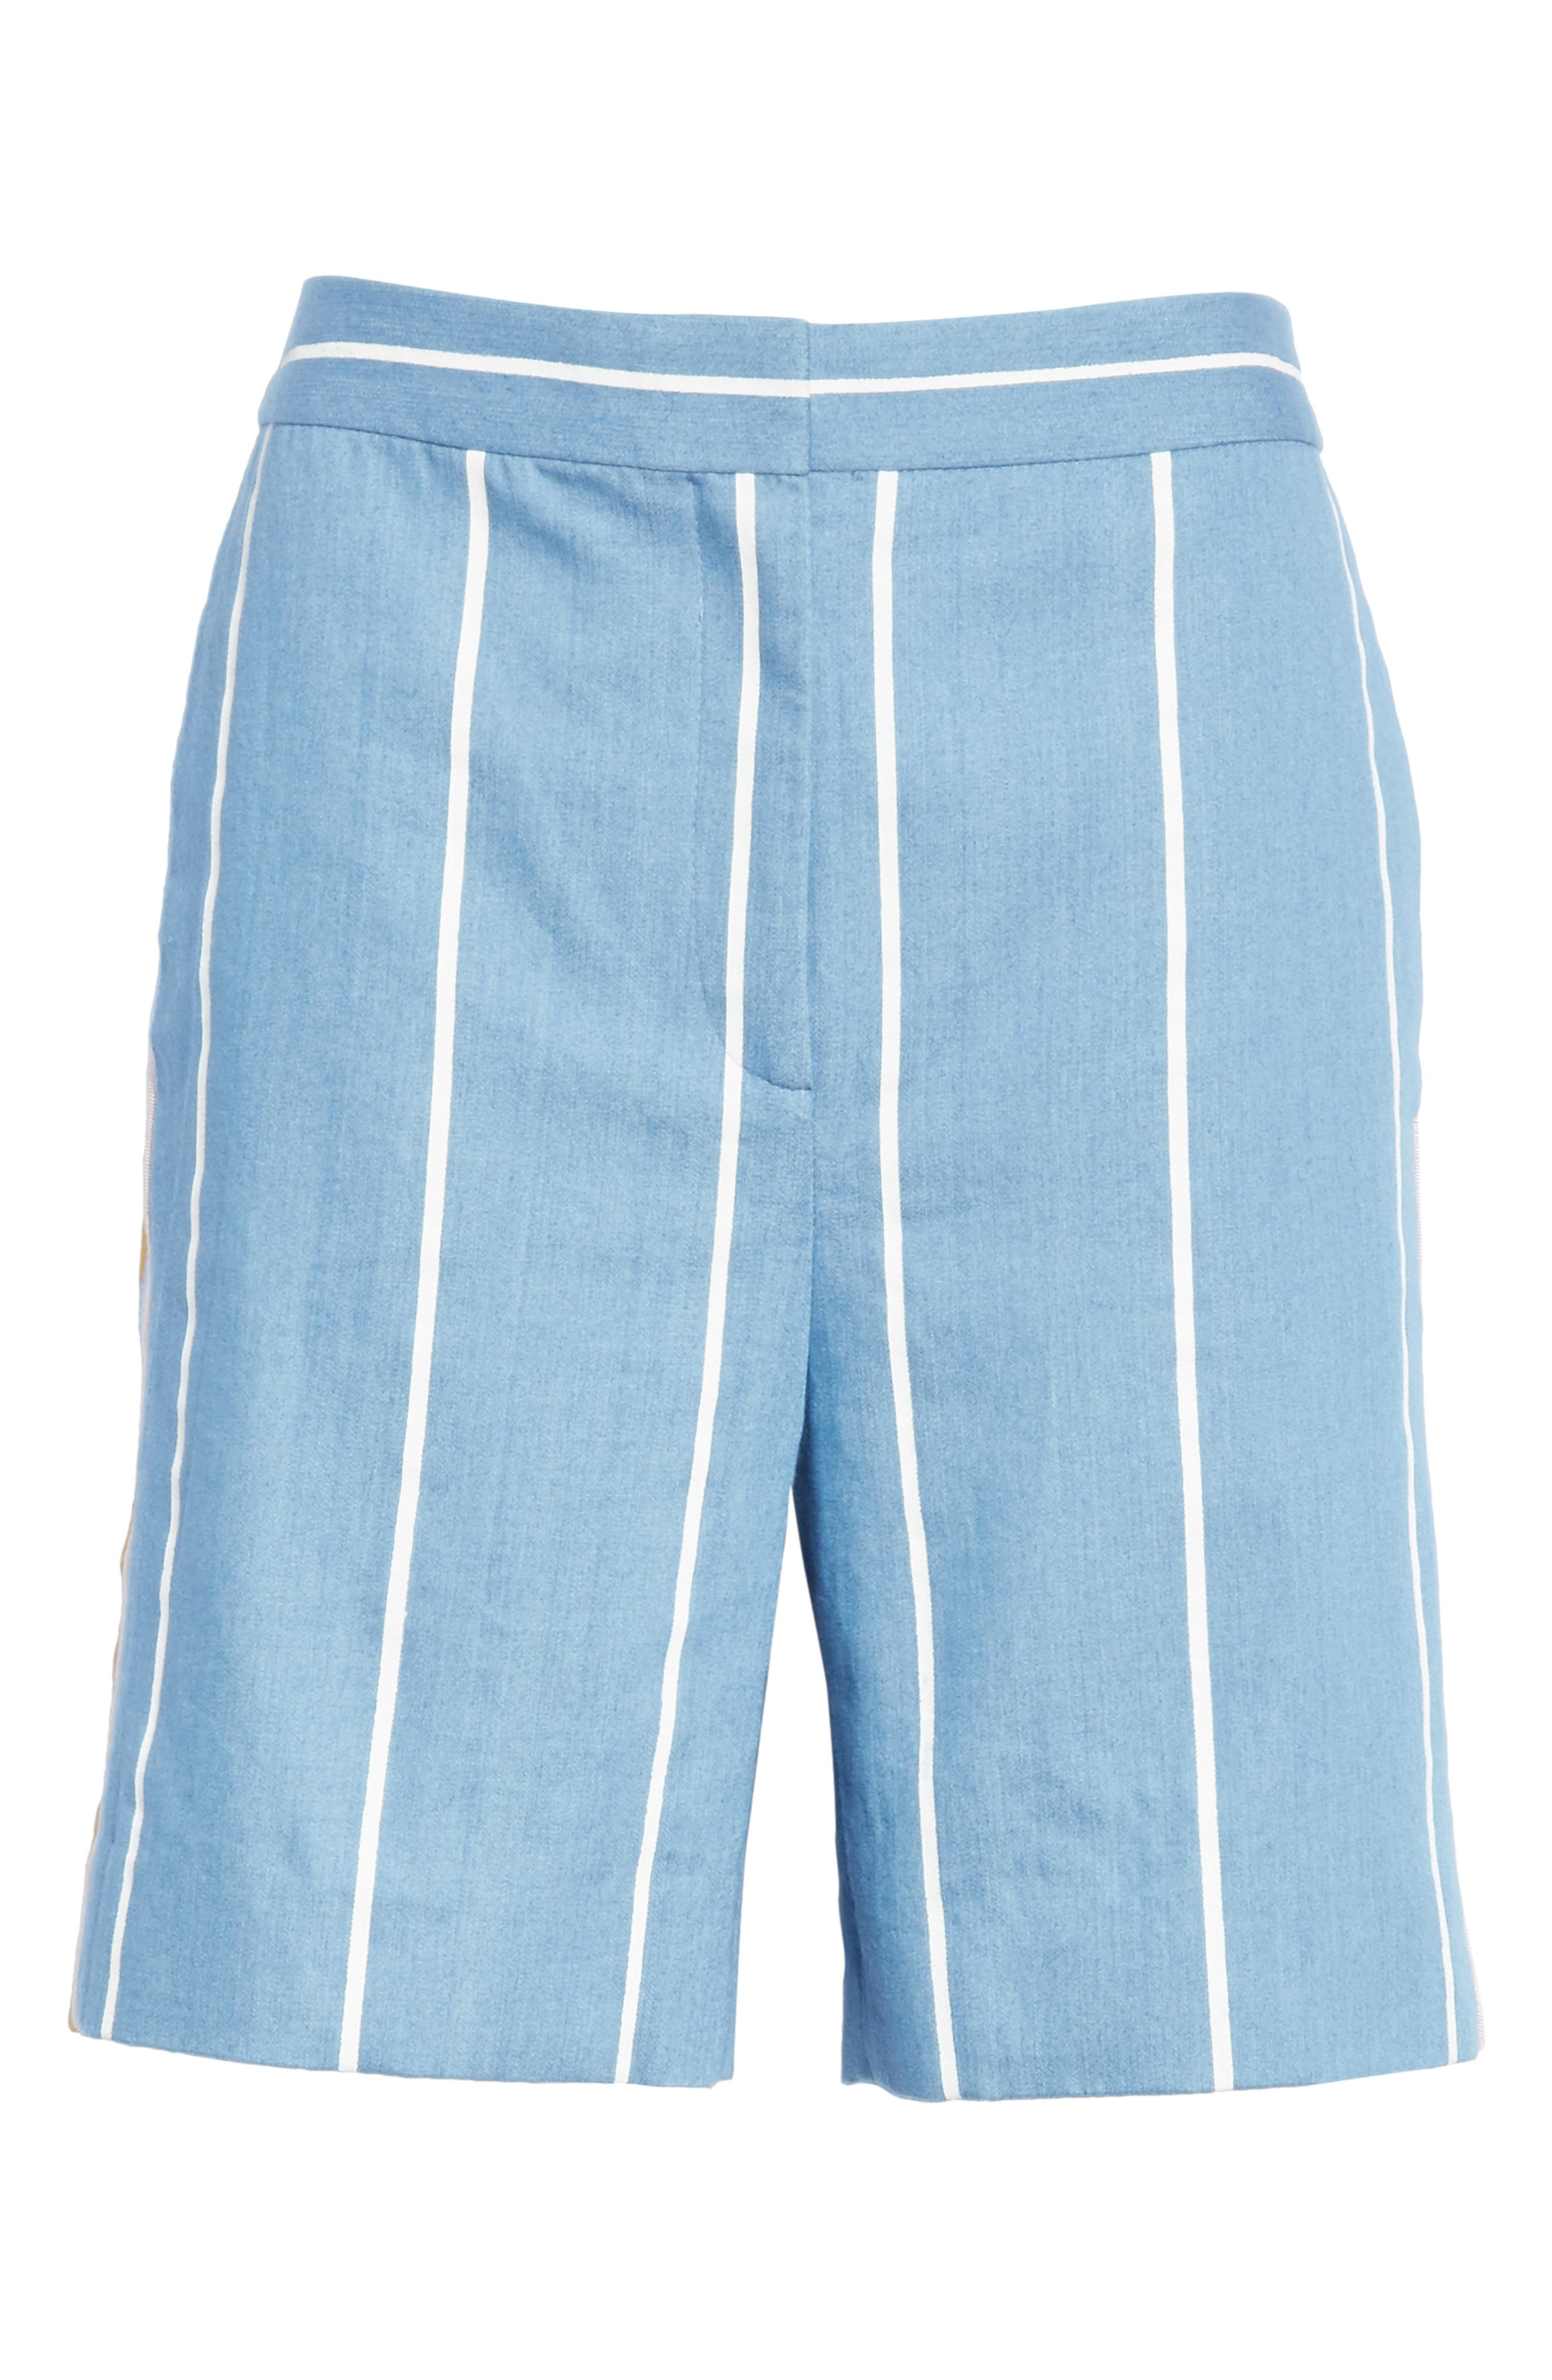 Stripe Slim Shorts,                             Alternate thumbnail 6, color,                             White Stripe